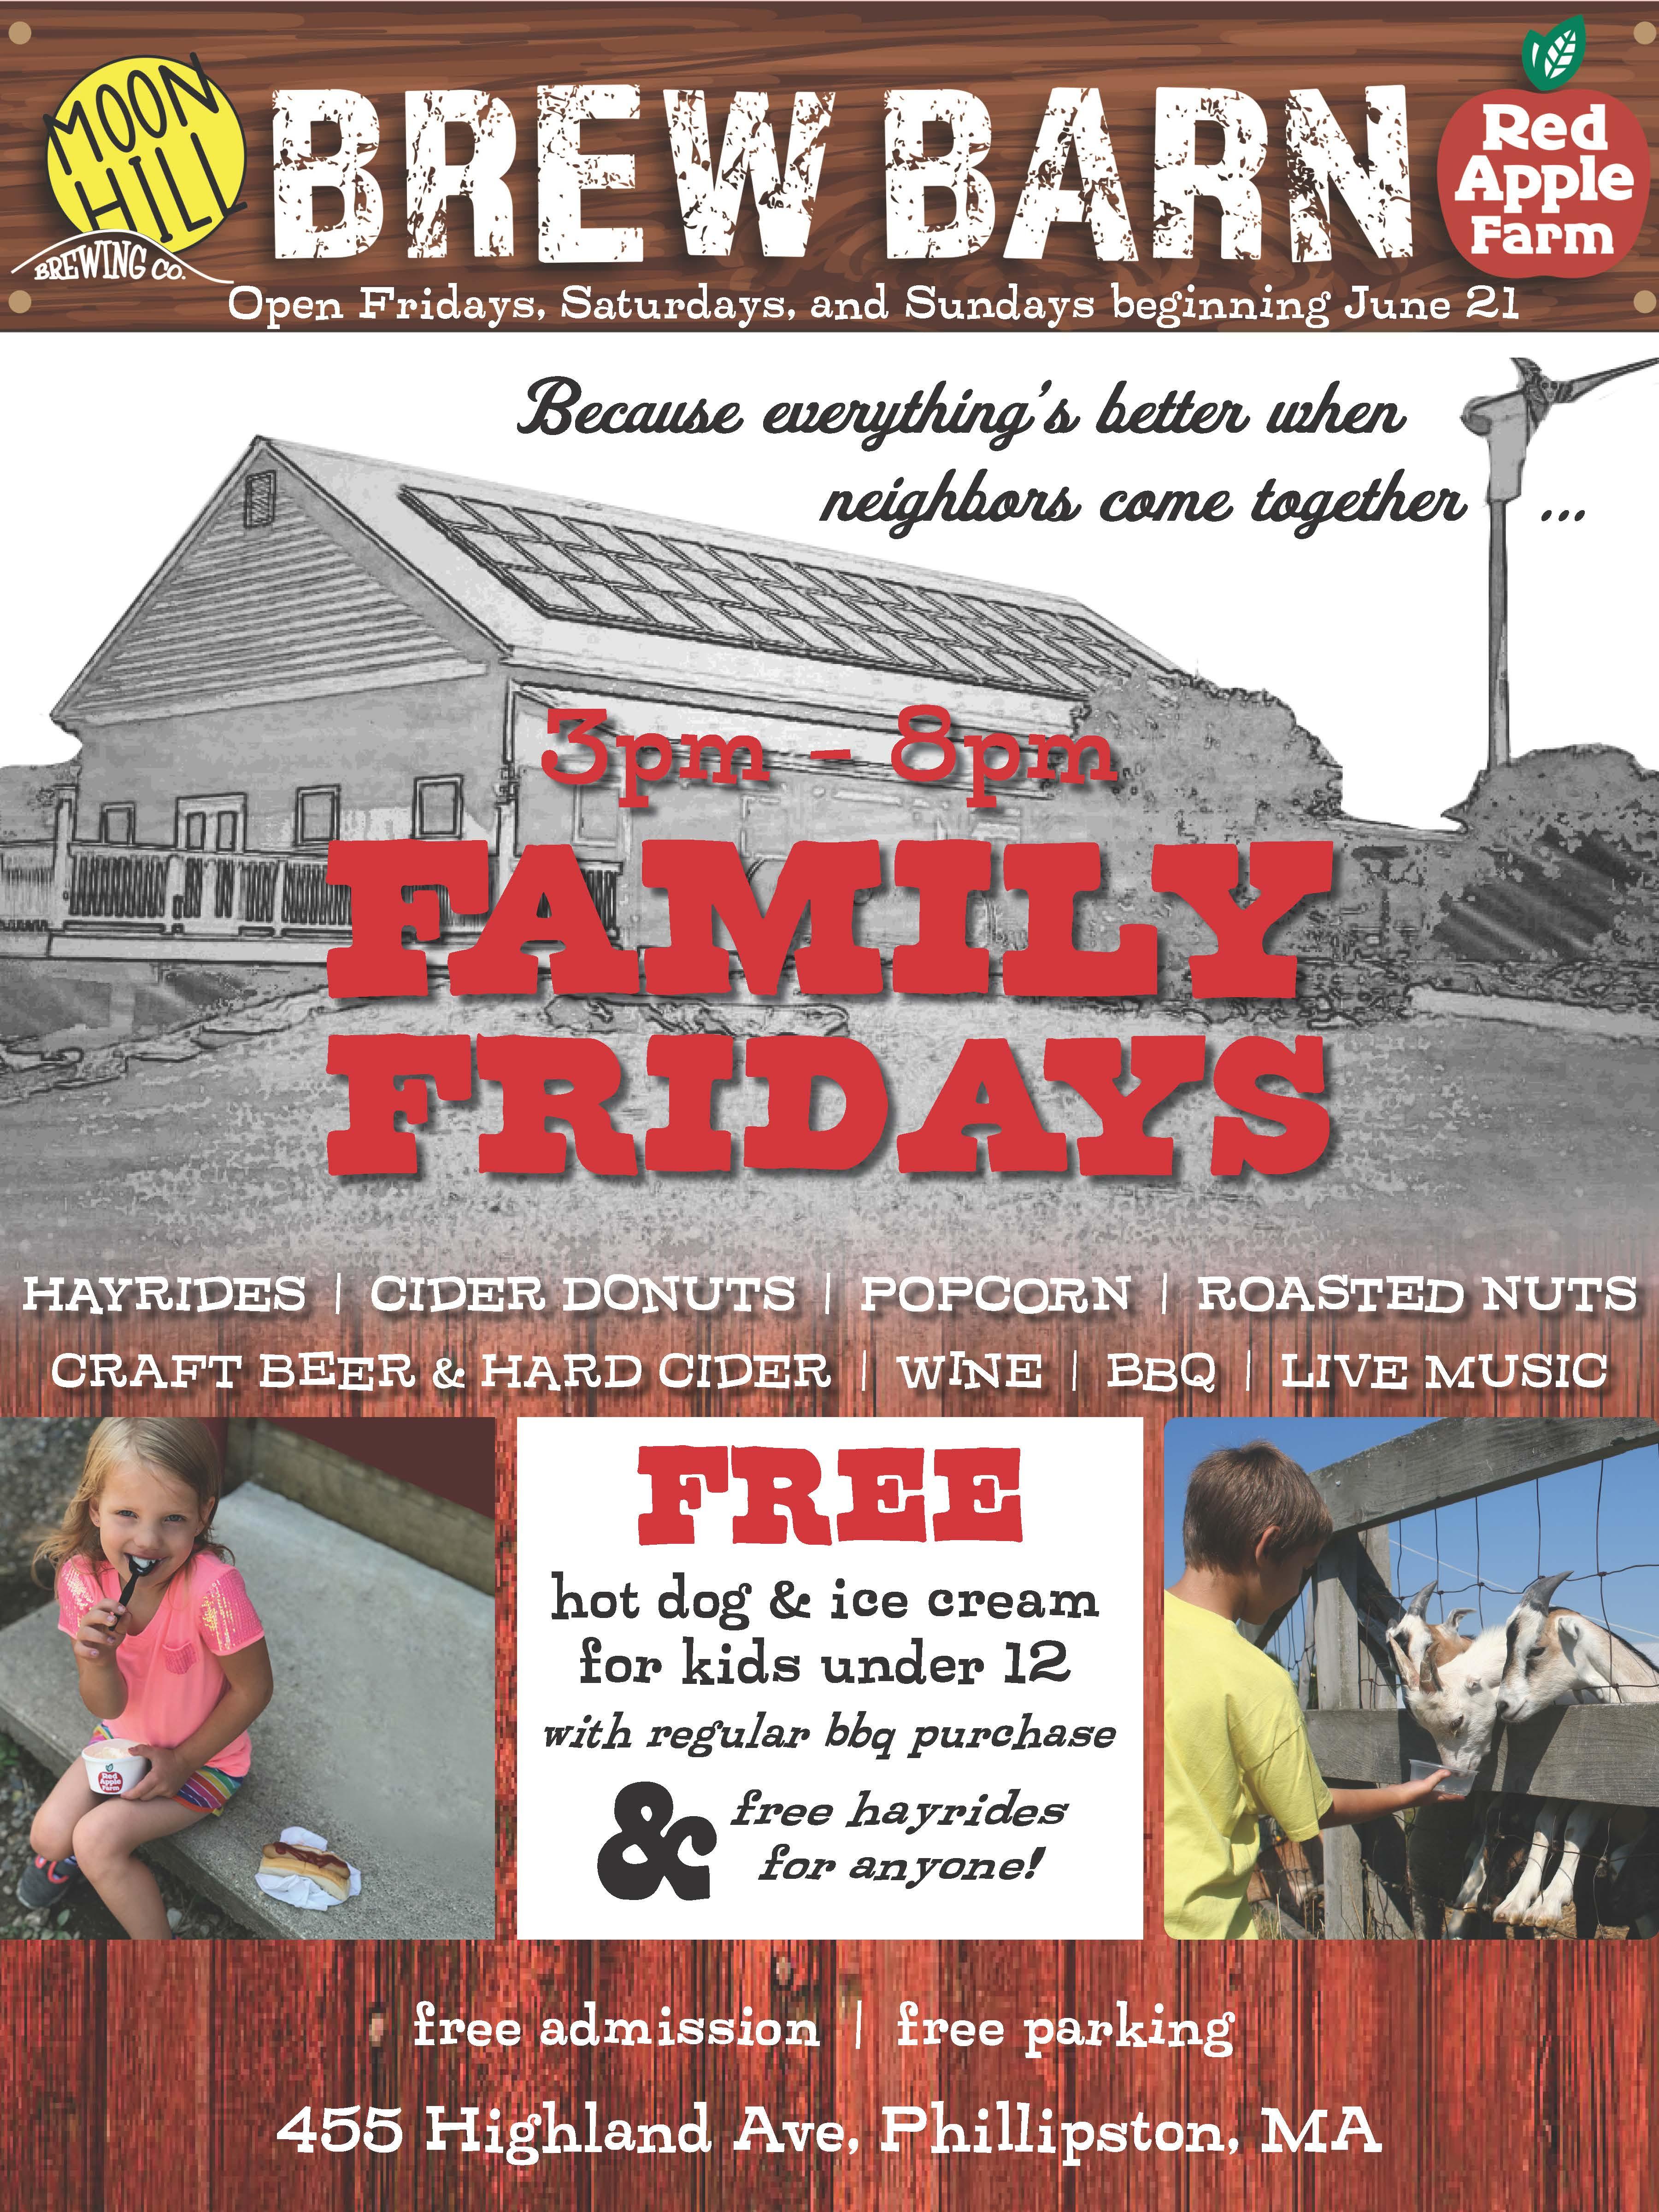 Family Fridays at the Brew Barn | Red Apple Farm